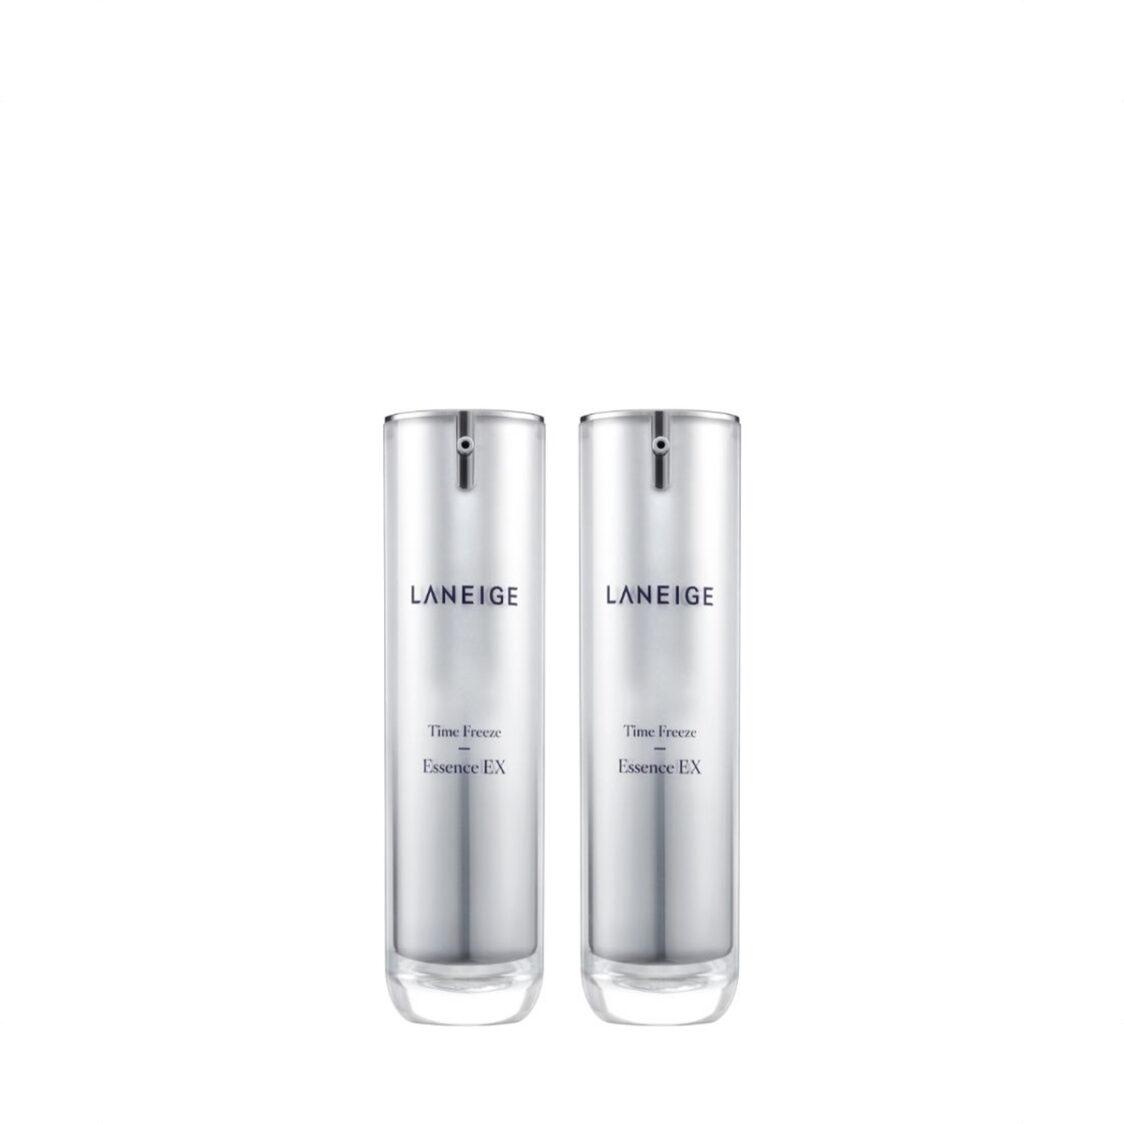 LANEIGE Time Freeze Essence EX Duo Set worth 186